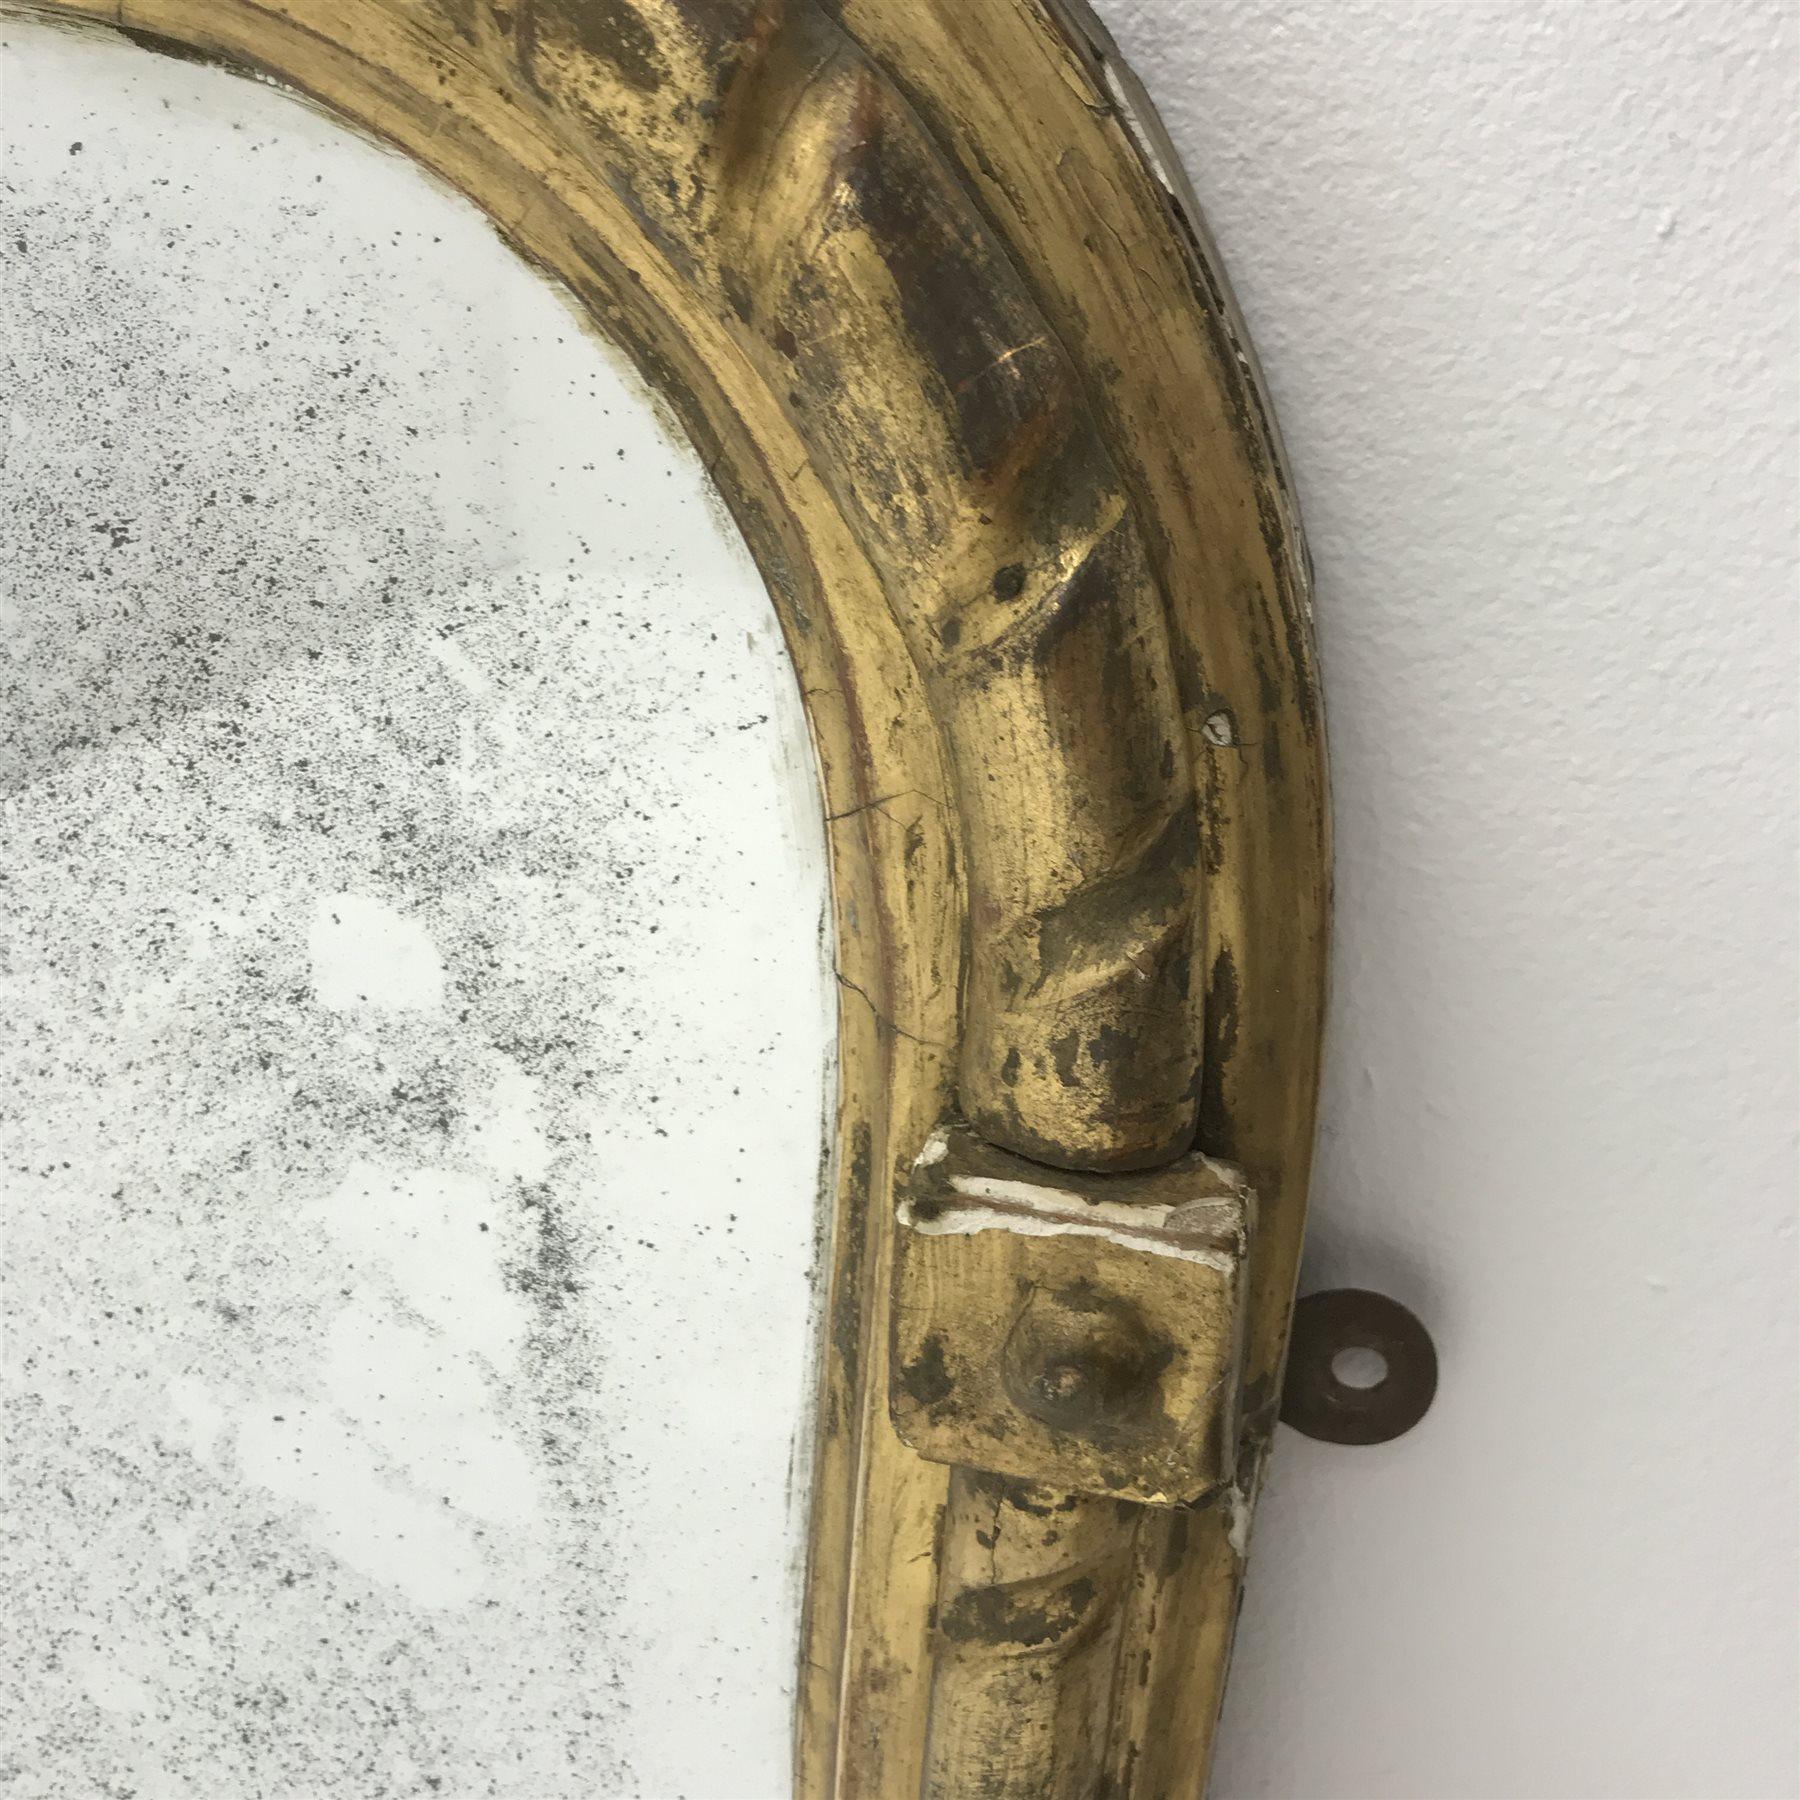 19th century gilt framed overmantle mirror, W122cm, H94cm - Image 3 of 4